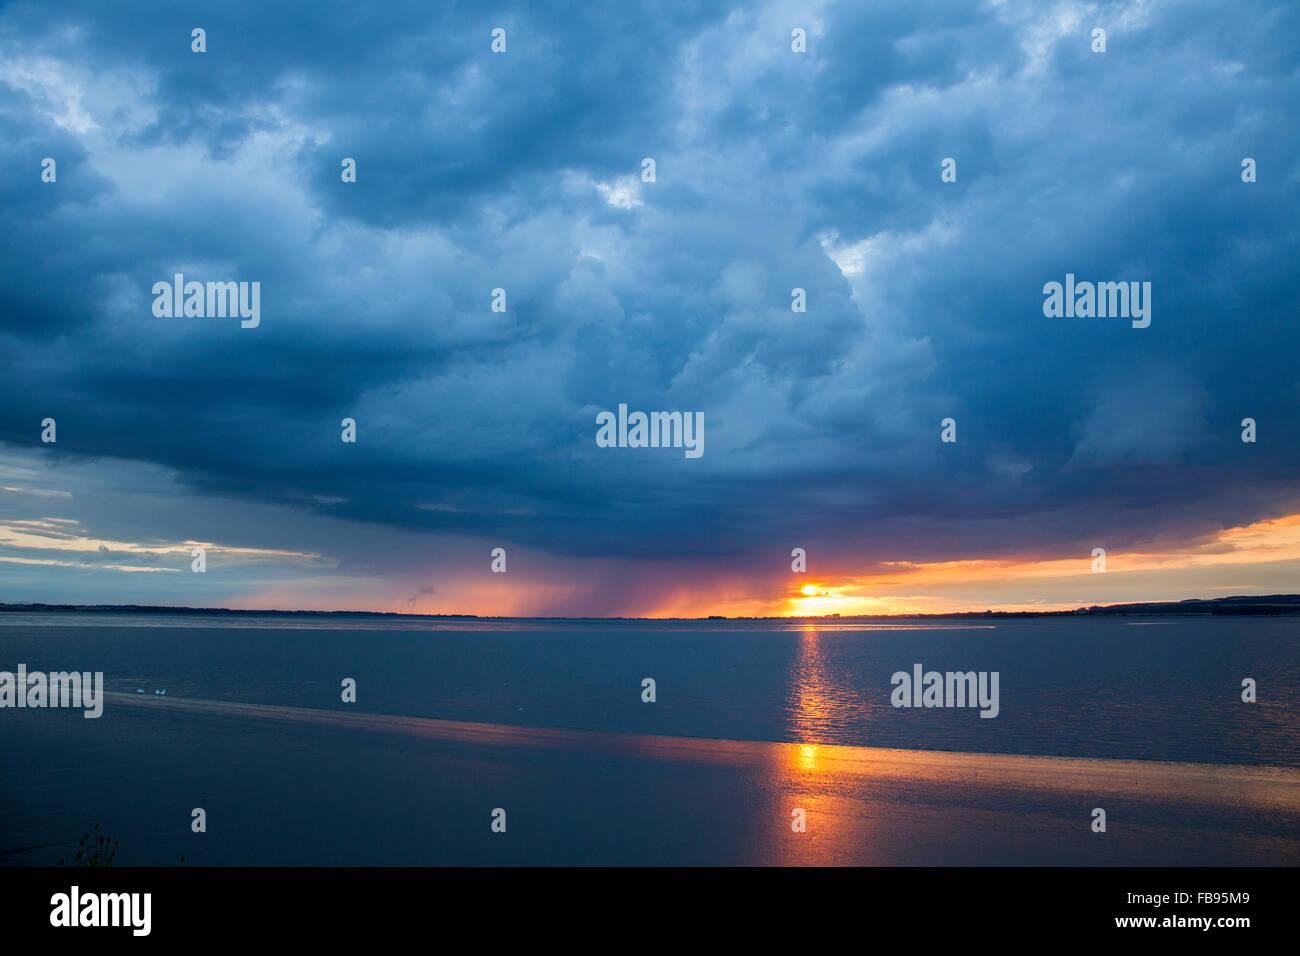 Storm at sunset, Humber estuary, dark skies at sunset, clouds and rain - Stock Image